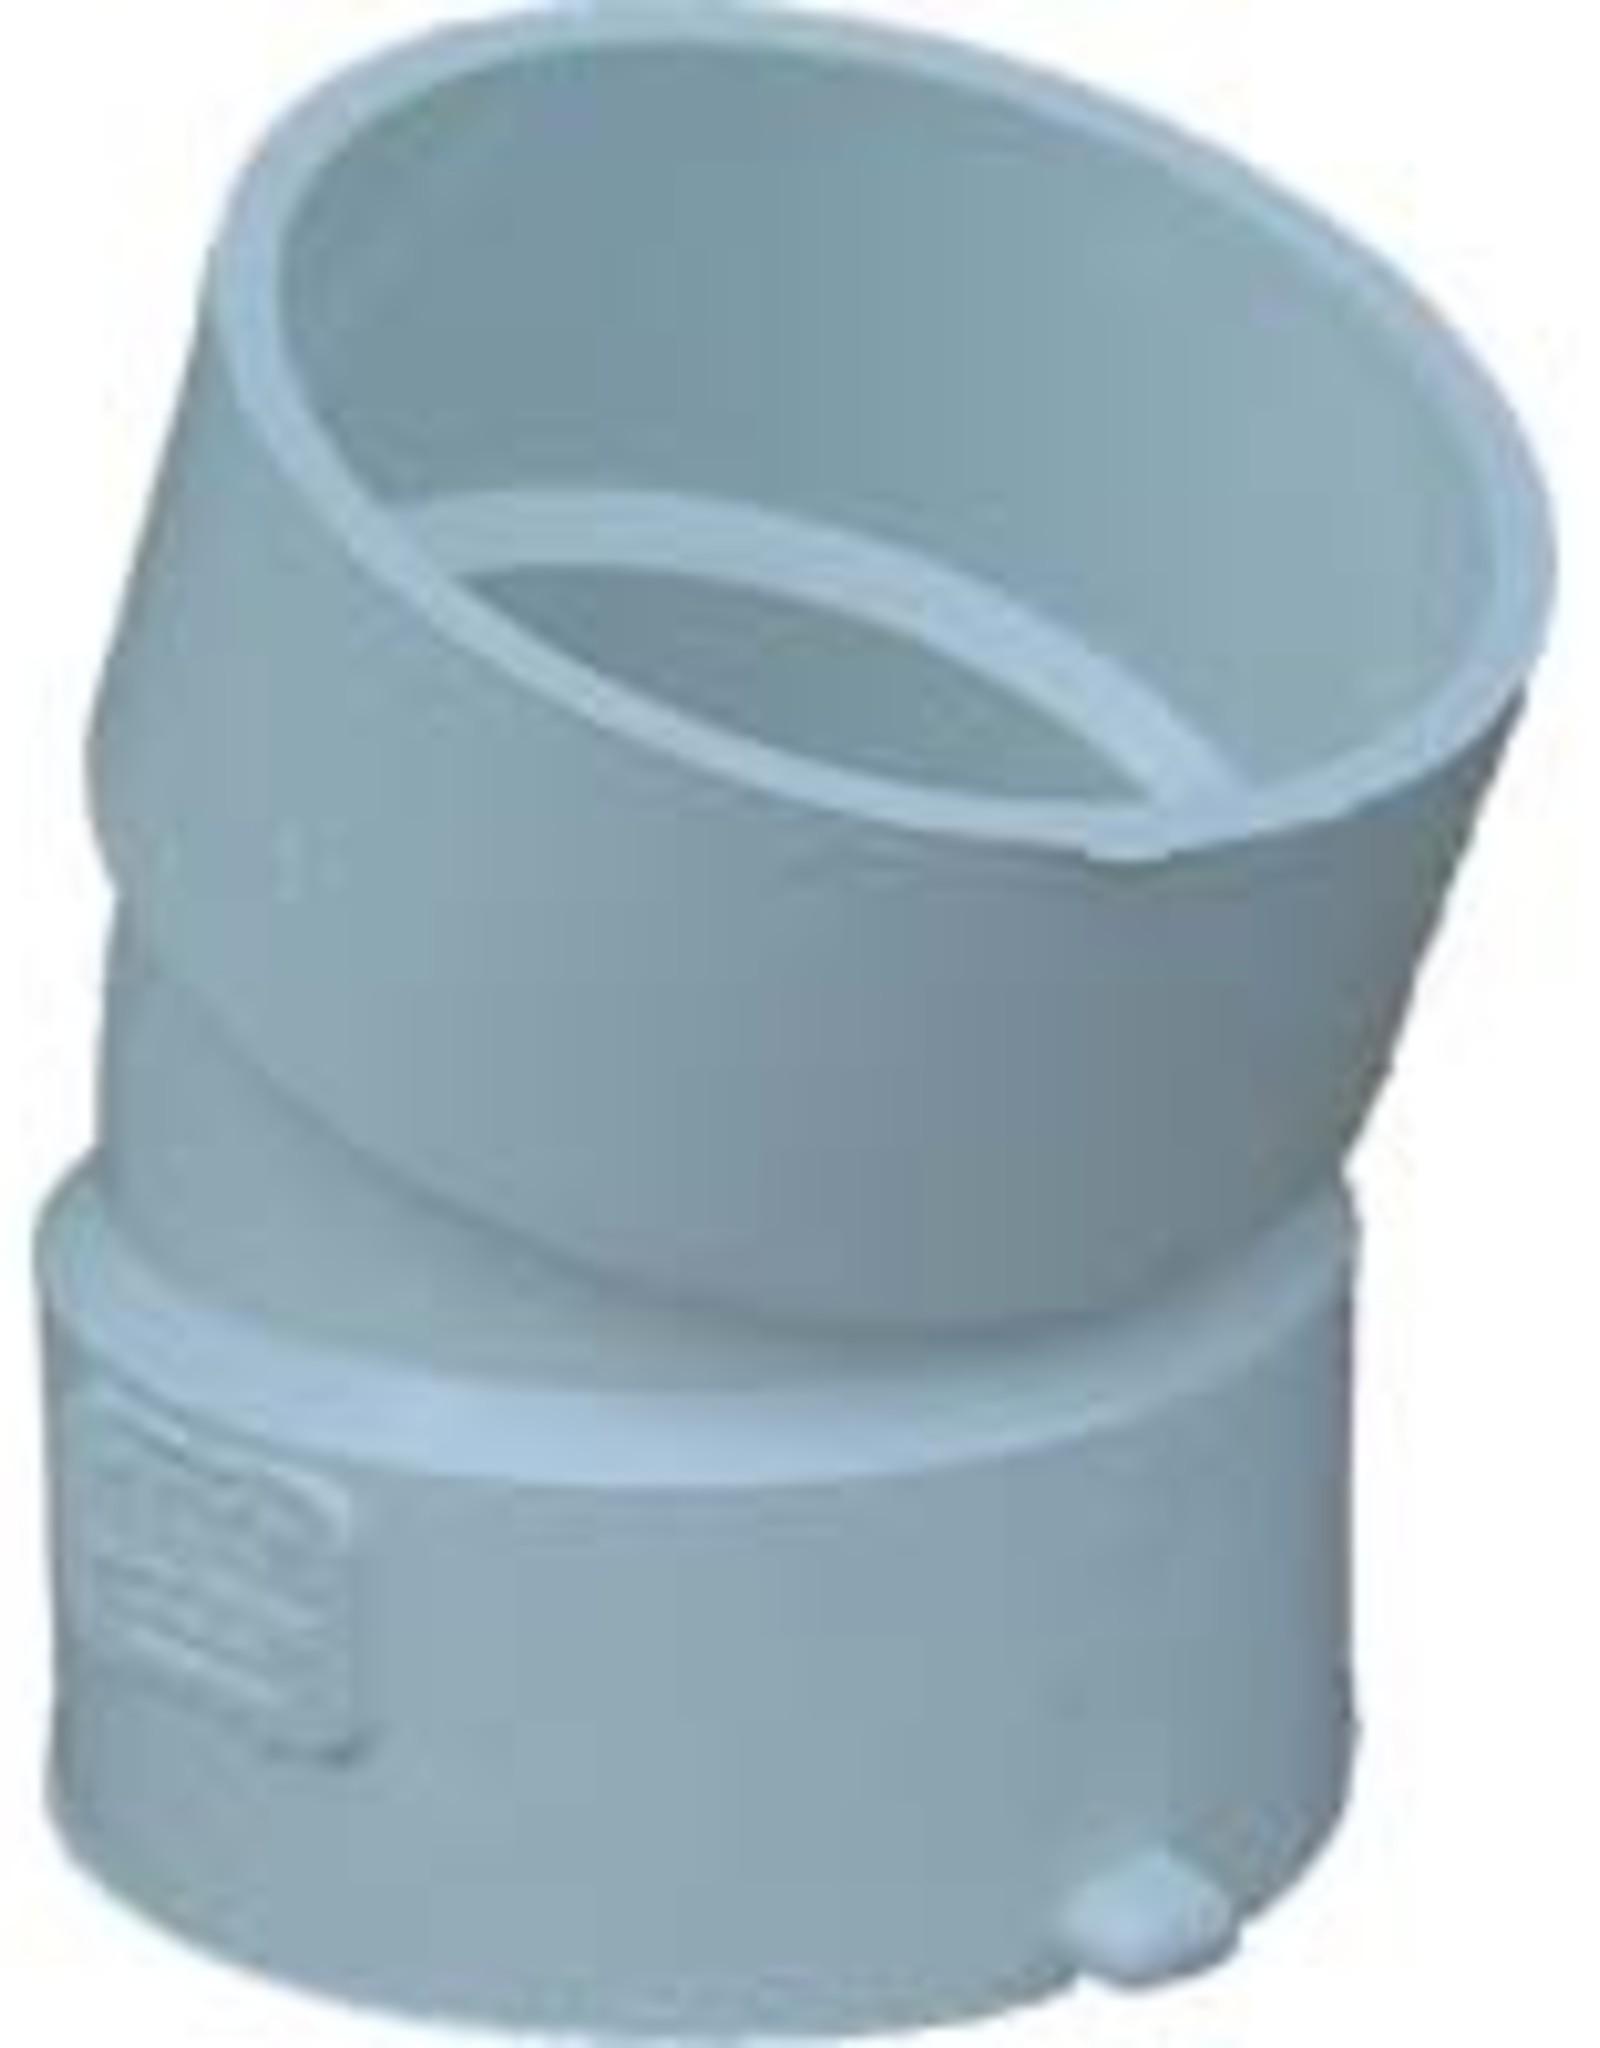 "NDS Drainage PVC 4"" Sewer & Drain 22 1/2 Degree Elbow Hub x Hub, NDS 4p04"